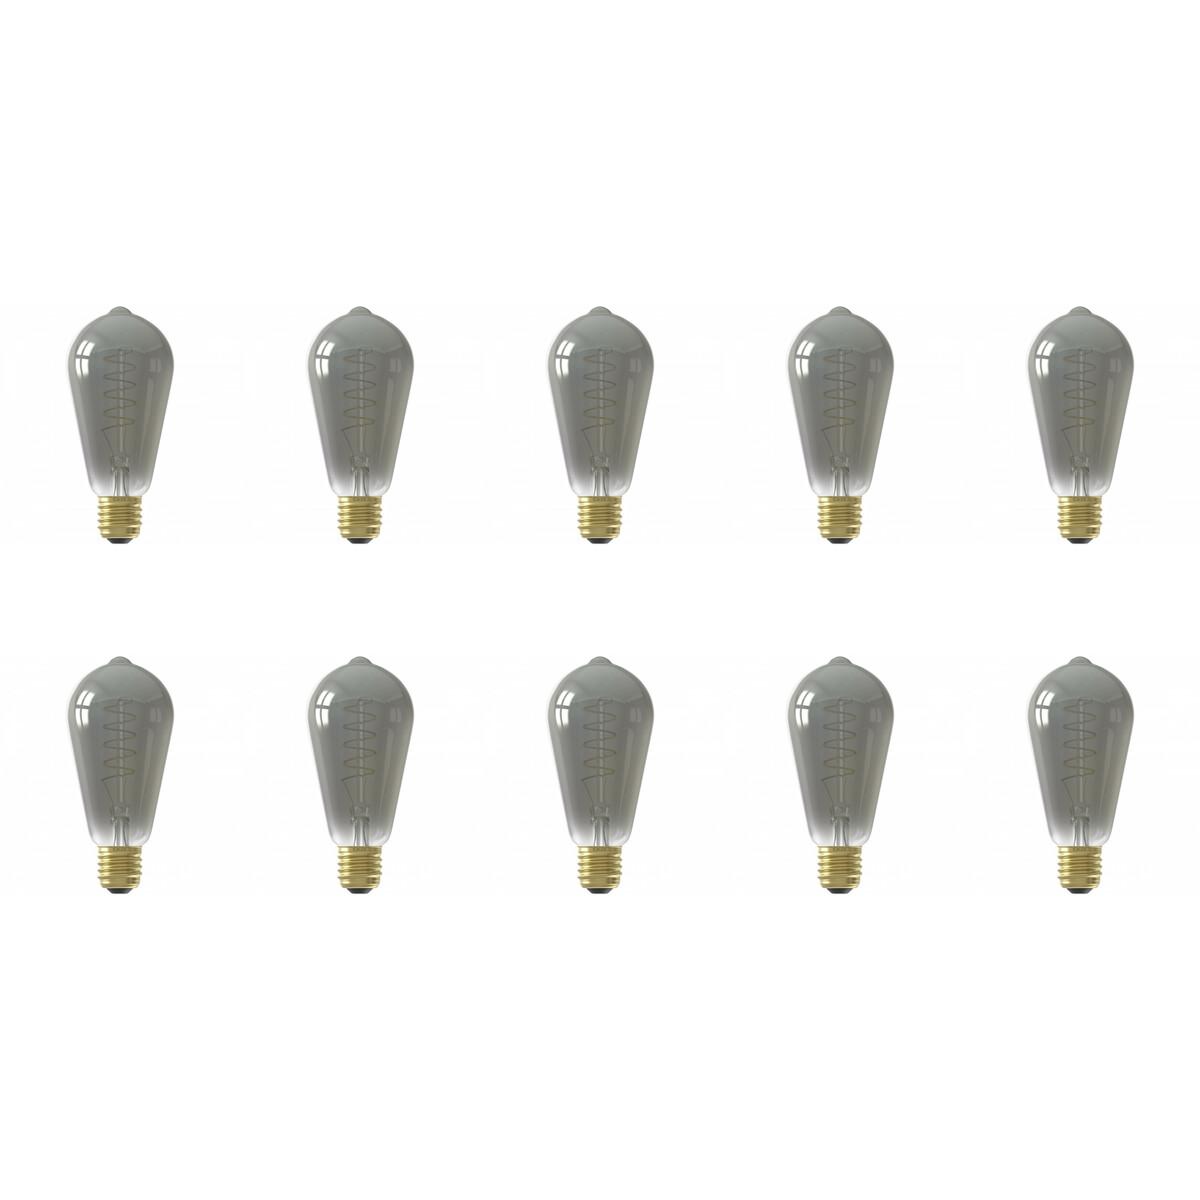 CALEX - LED Lamp 10 Pack - Filament ST64 - E27 Fitting - Dimbaar - 4W - Warm Wit 2100K - Titanium